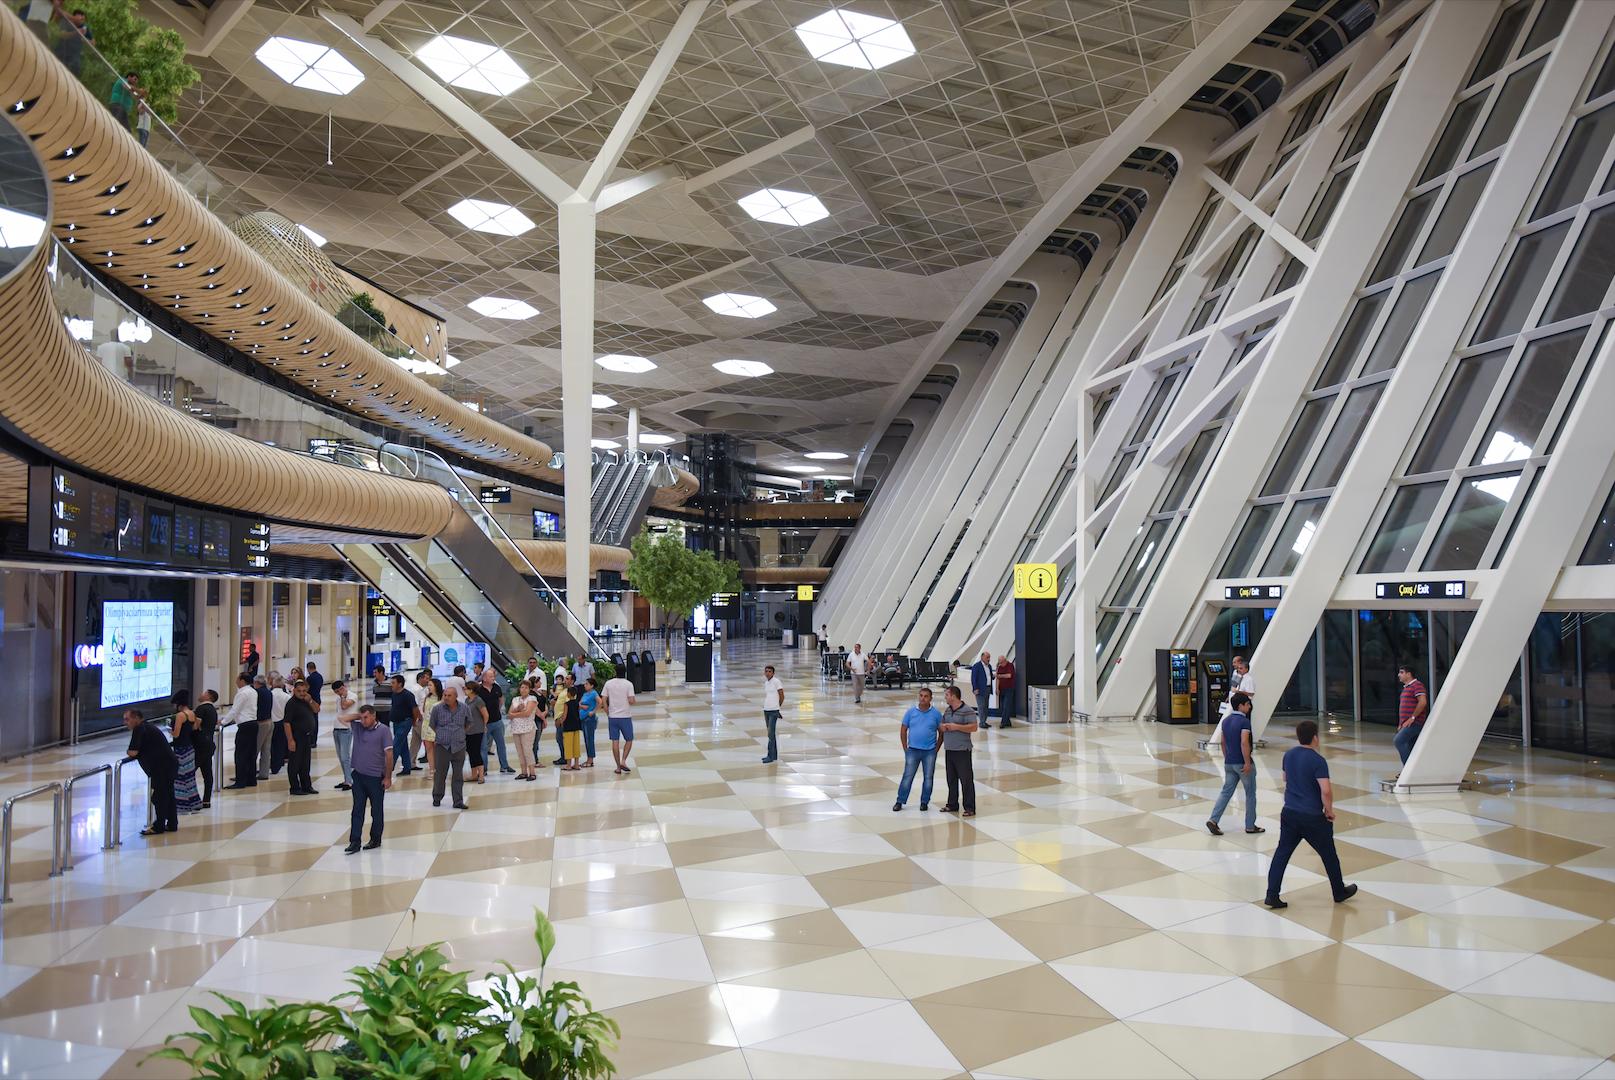 "Вестибюль Международного аэропорта имени Гейдара Алиева в Баку. Фото: © Sputnik / РИА ""Новости"" / Мурад Оруджев"